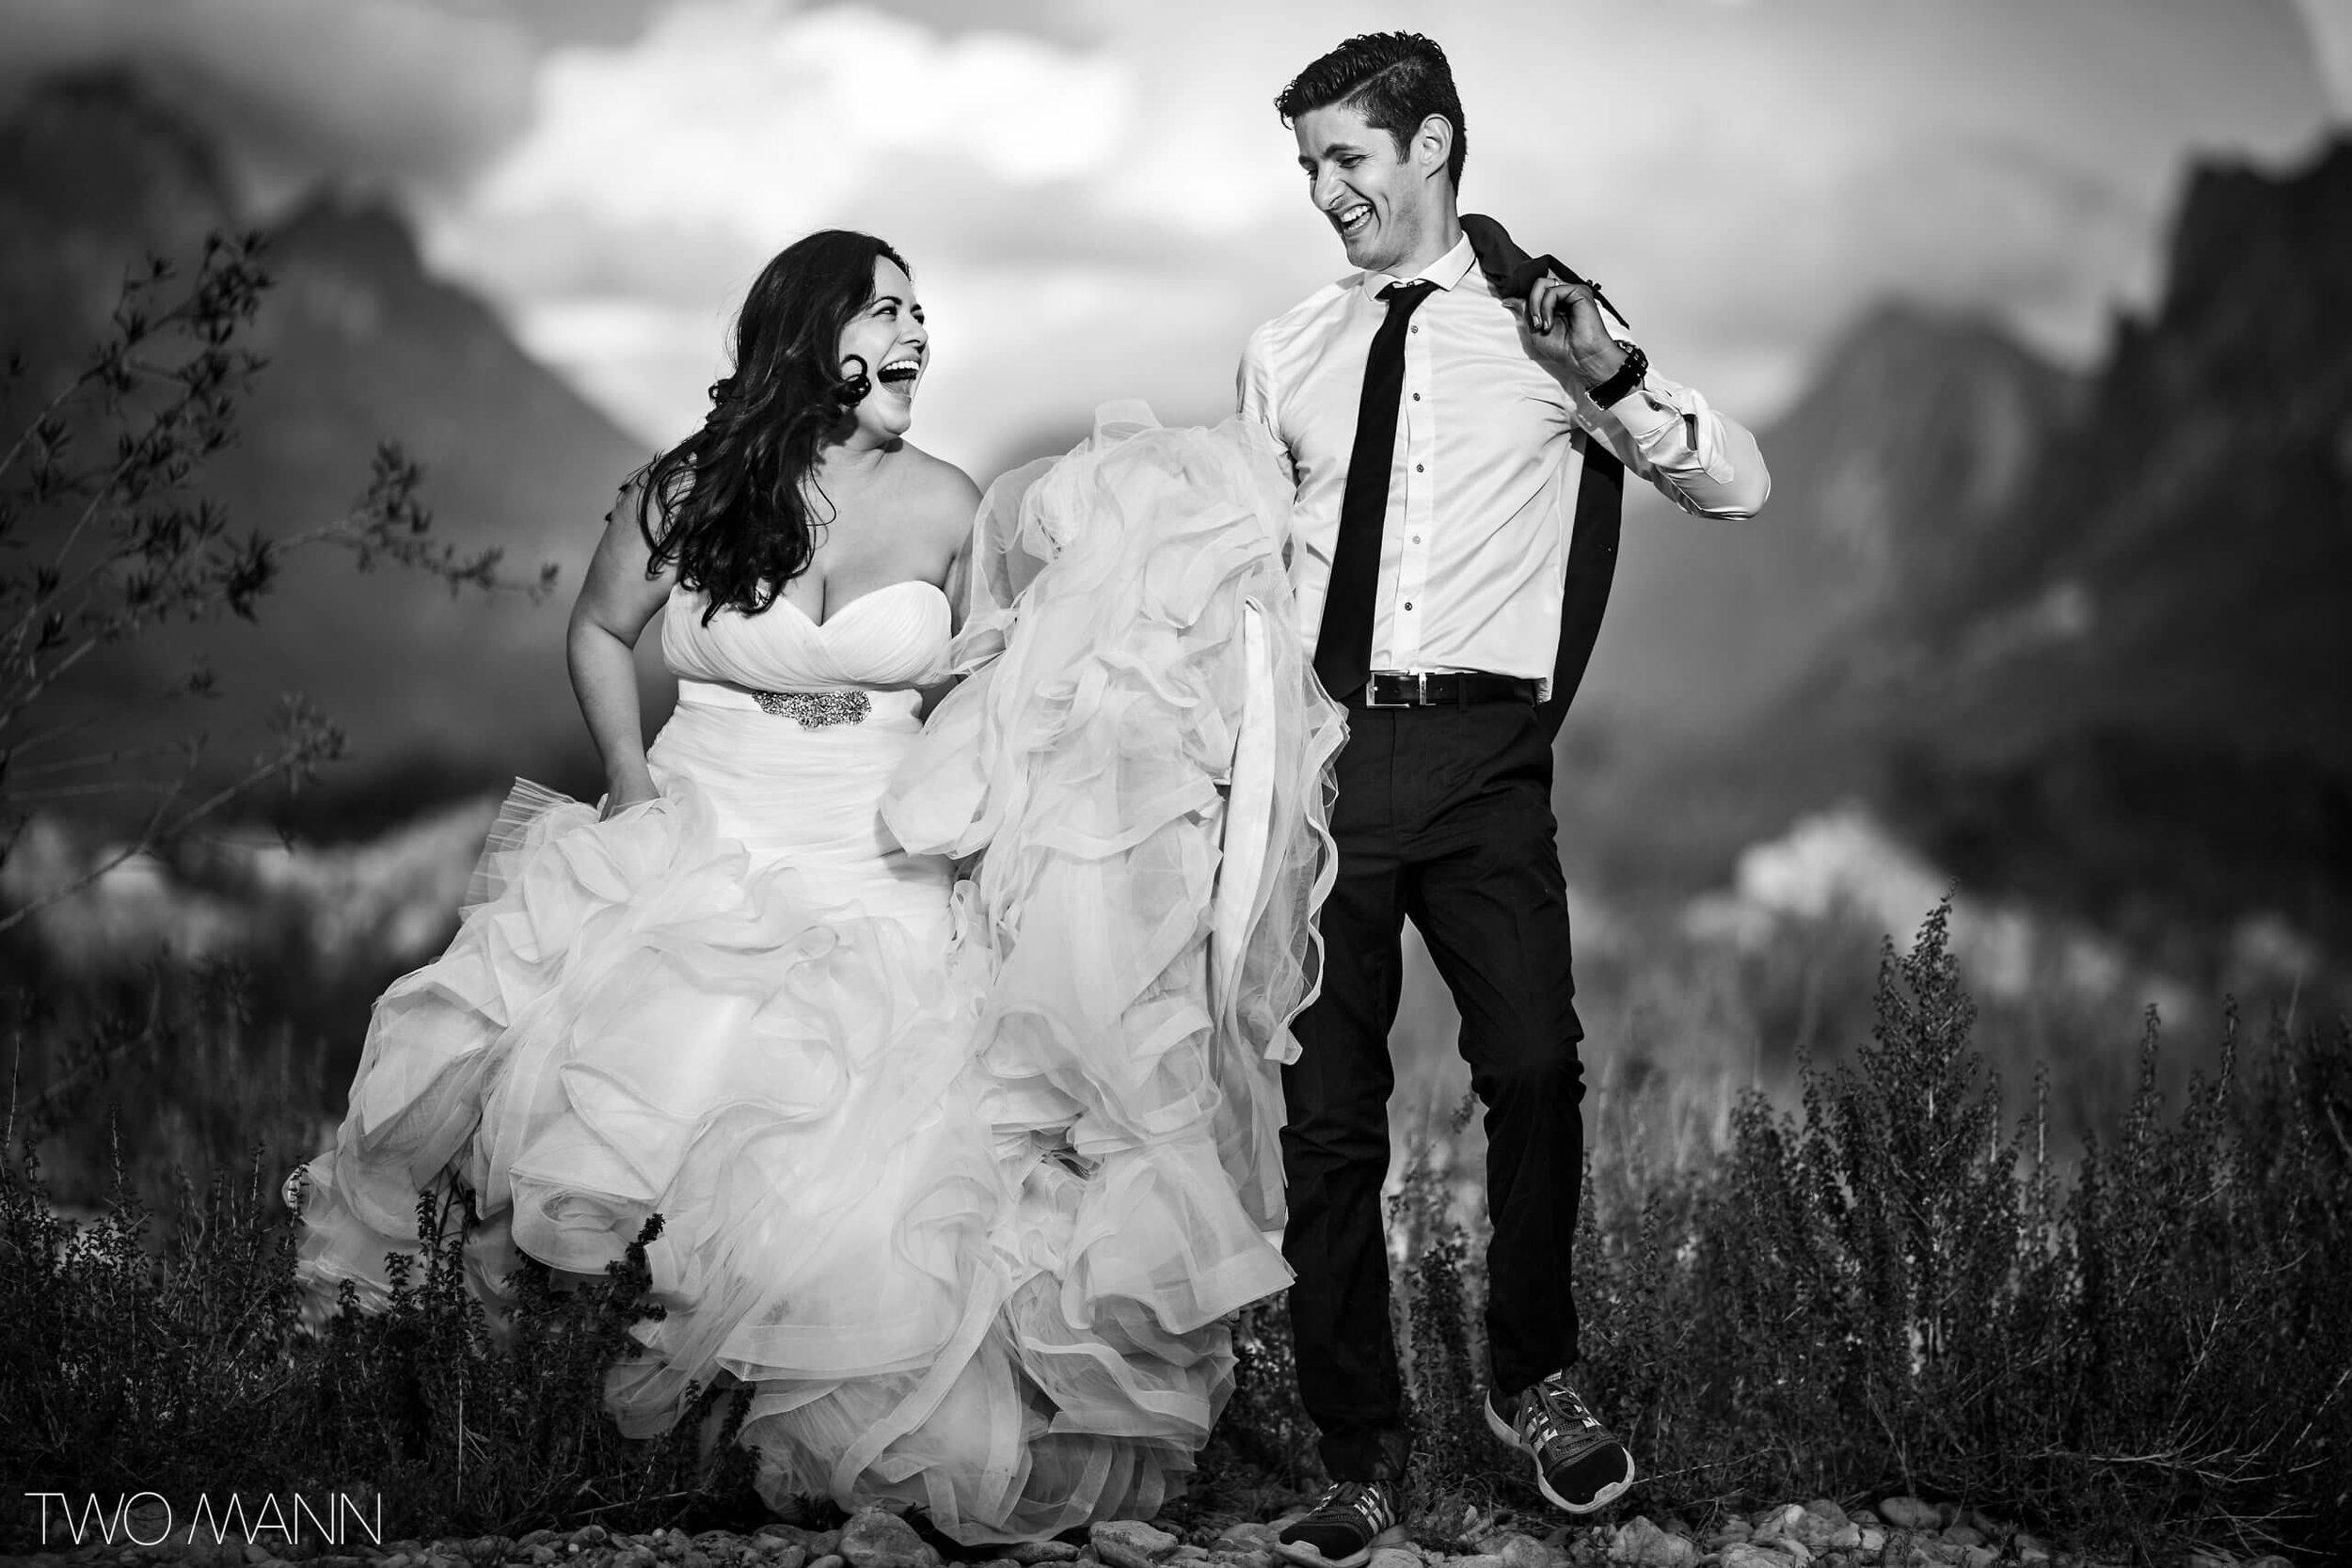 Mexico-Wedding-Photography-Two-Mann-Monica-Mike-Monterrey-32-2560x1707.jpg